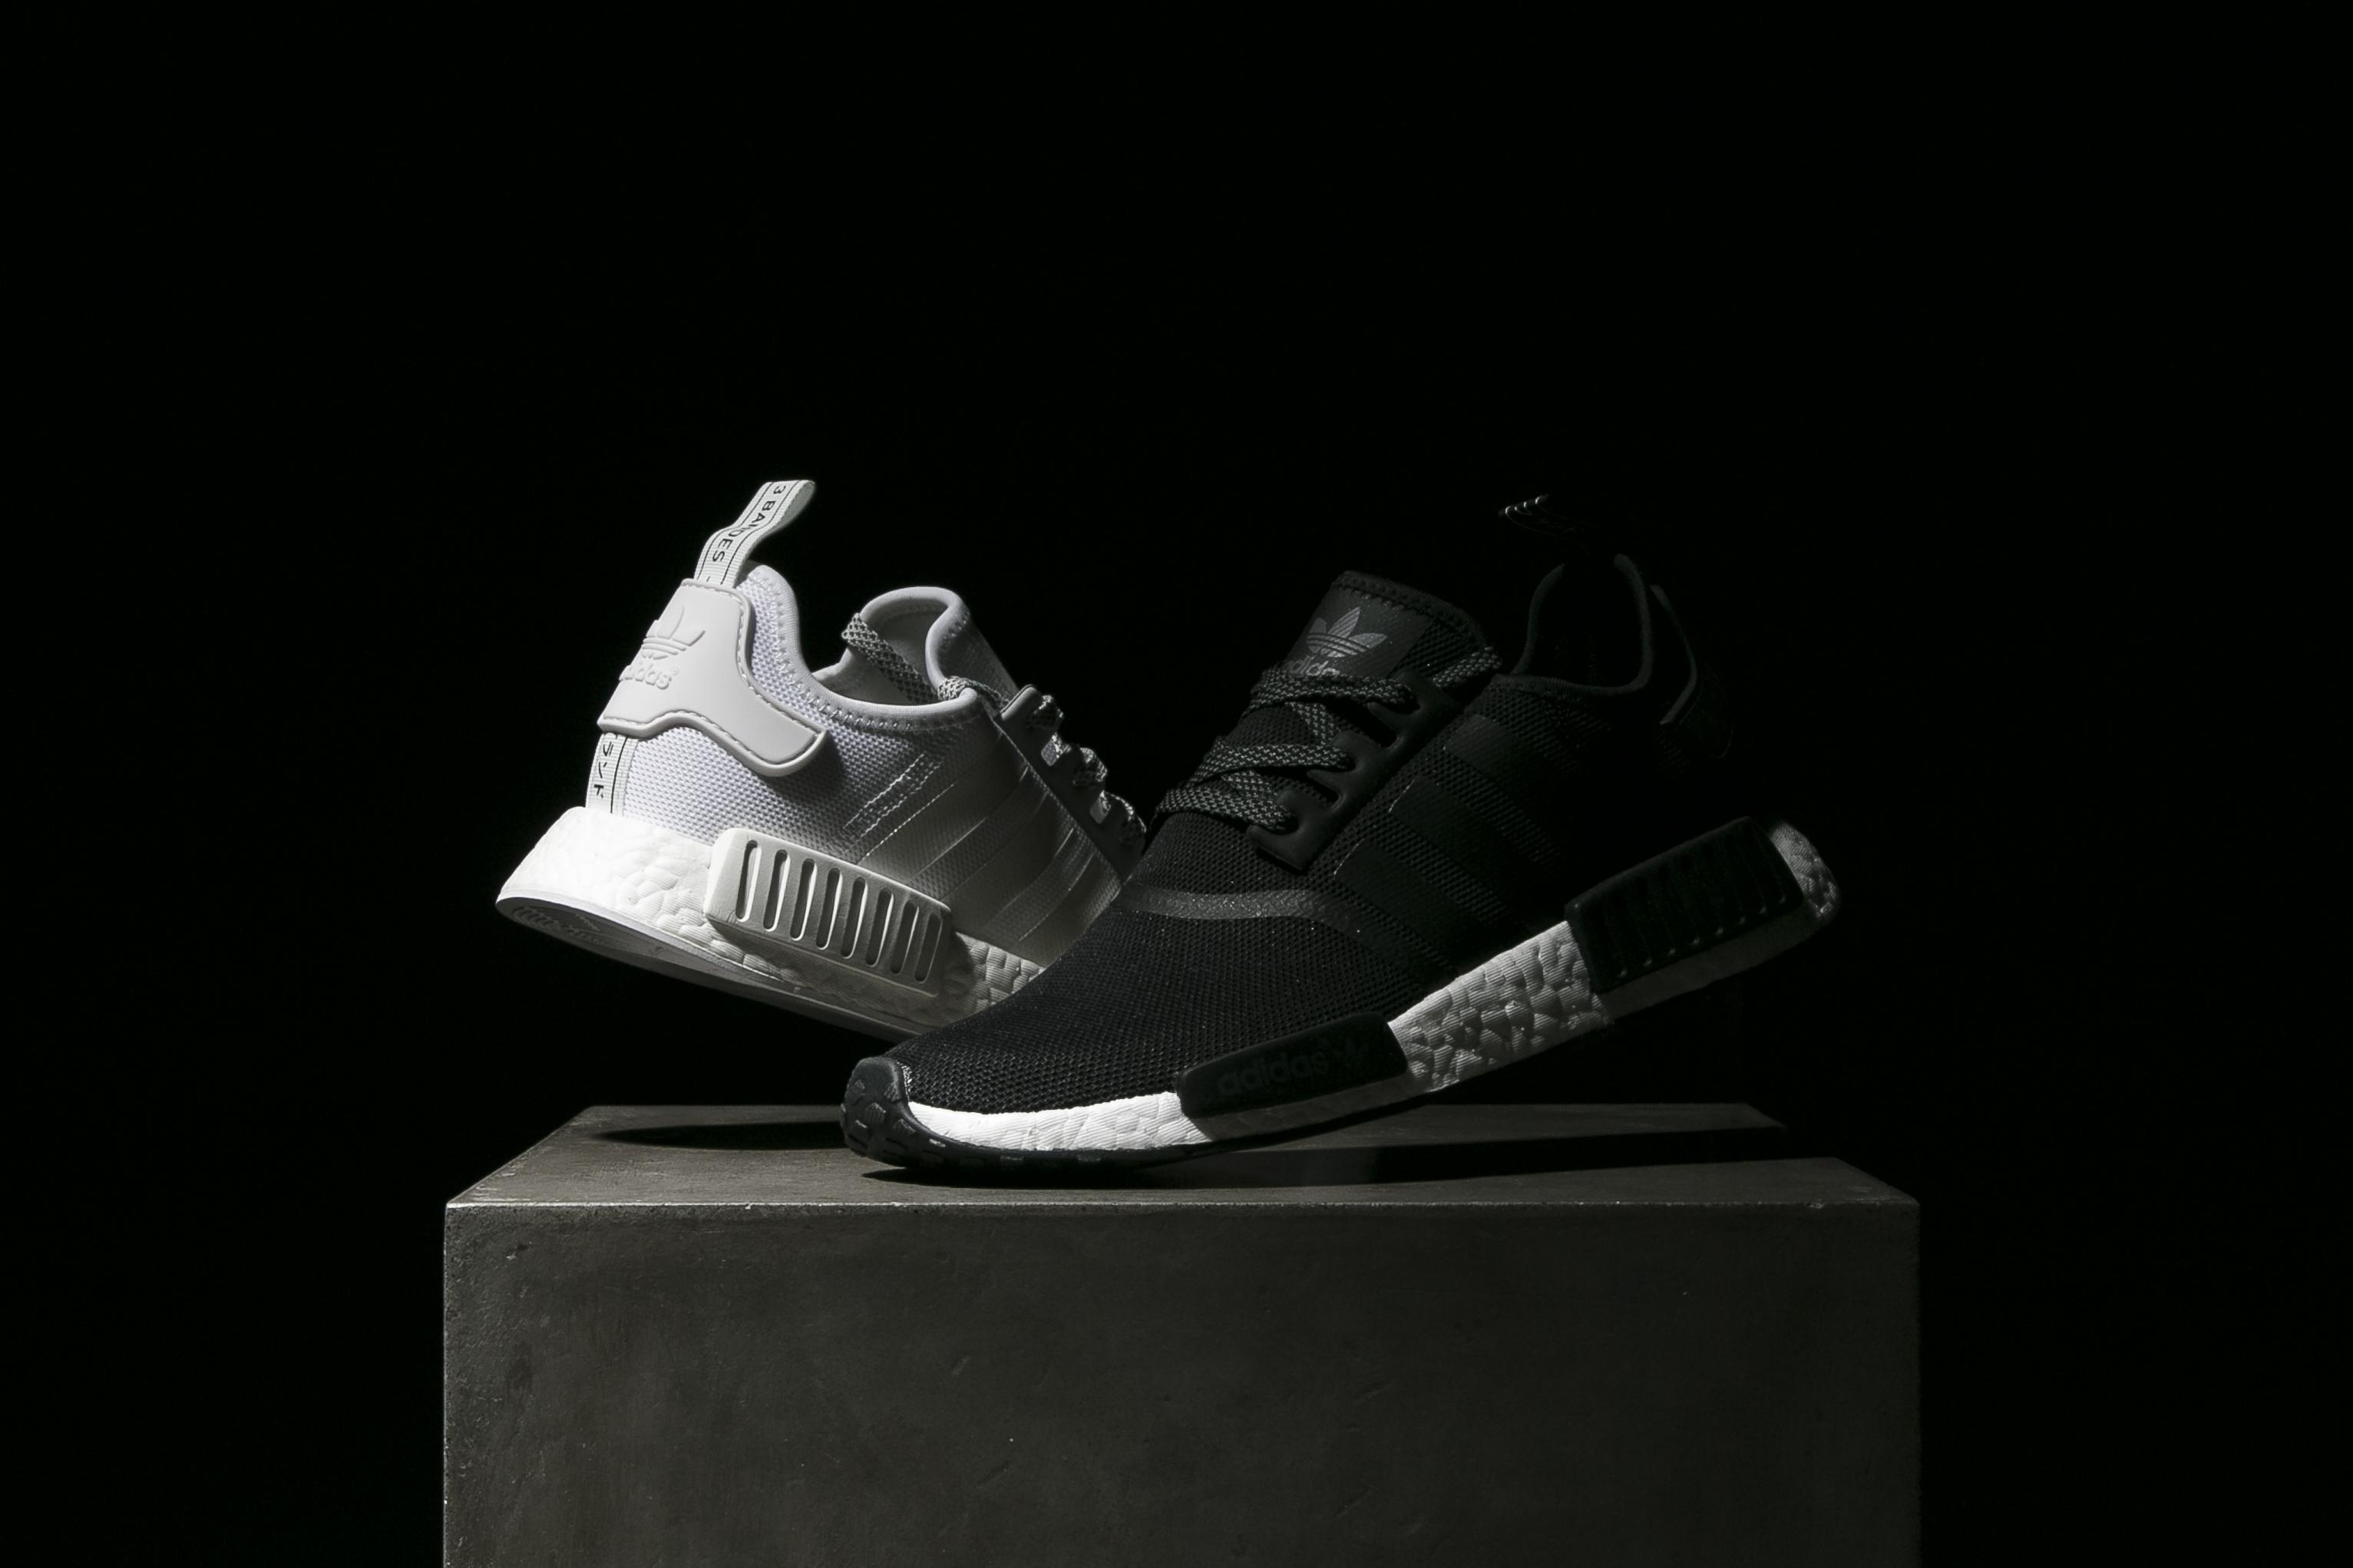 53471e7137f58 adidas NMD Reflective Black and White | SneakerNews.com